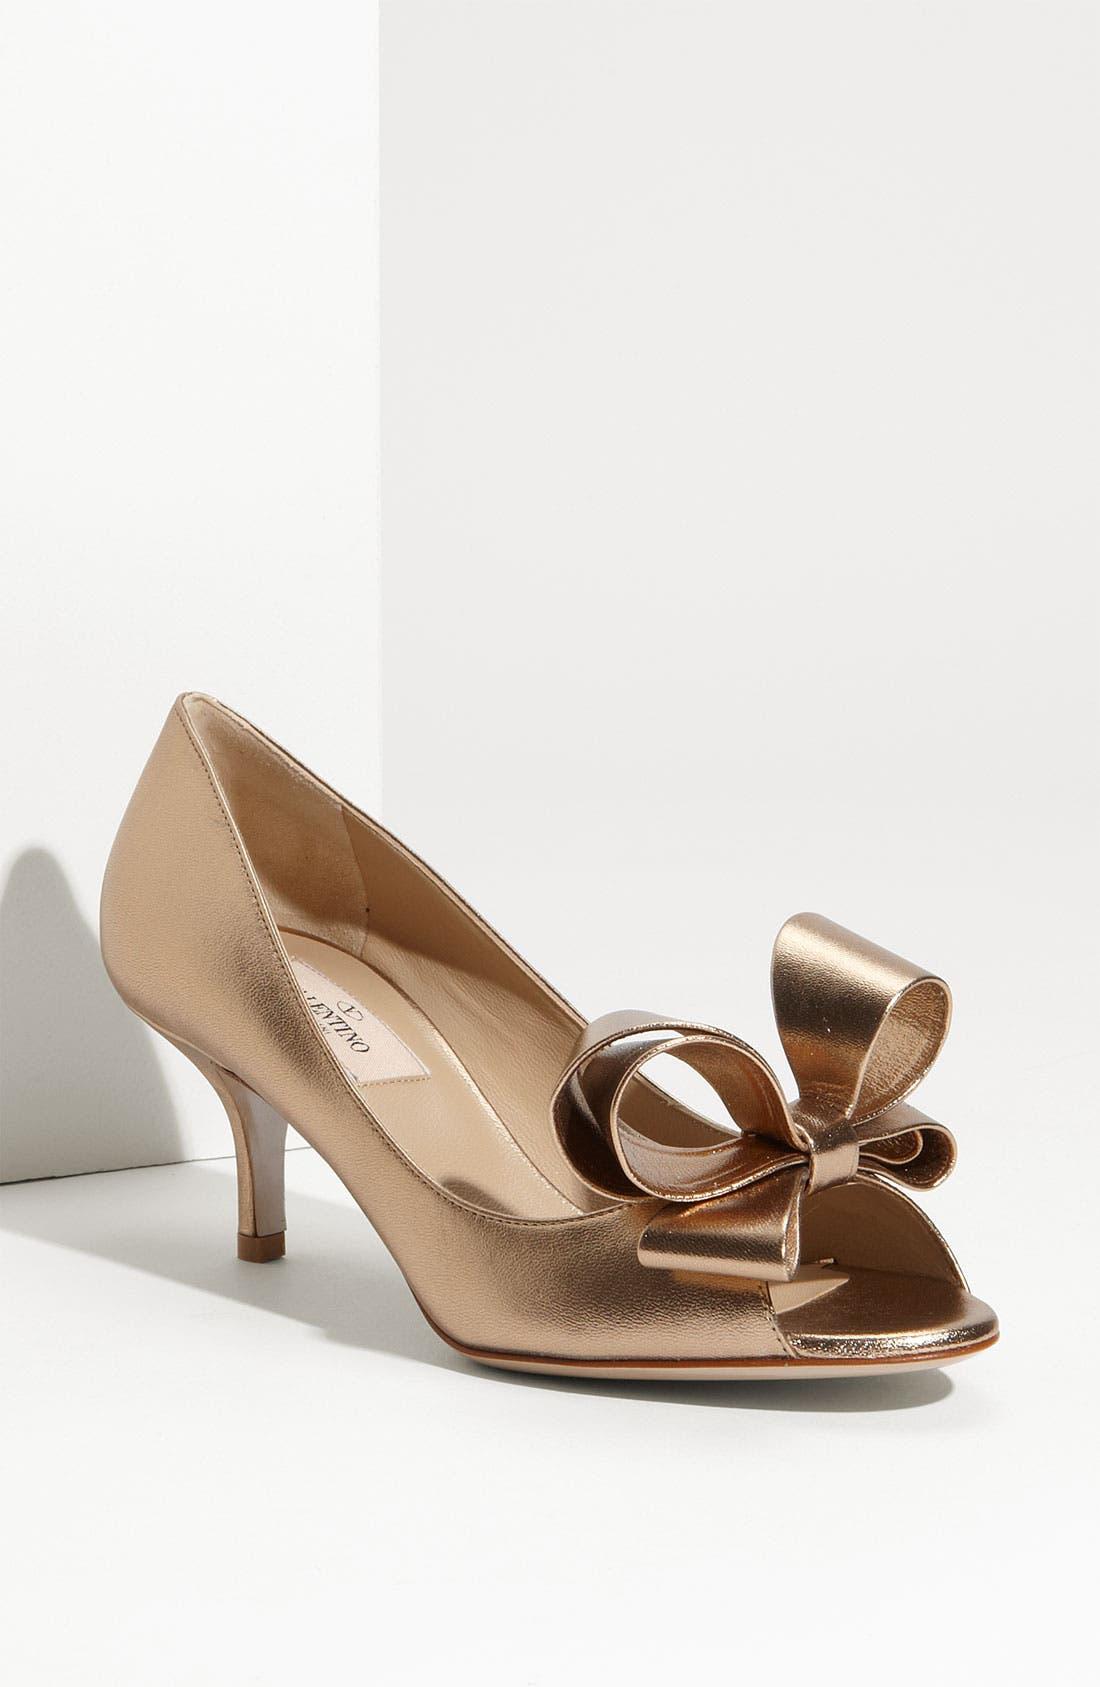 Main Image - VALENTINO GARAVANI Metallic Nappa Couture Bow Pump